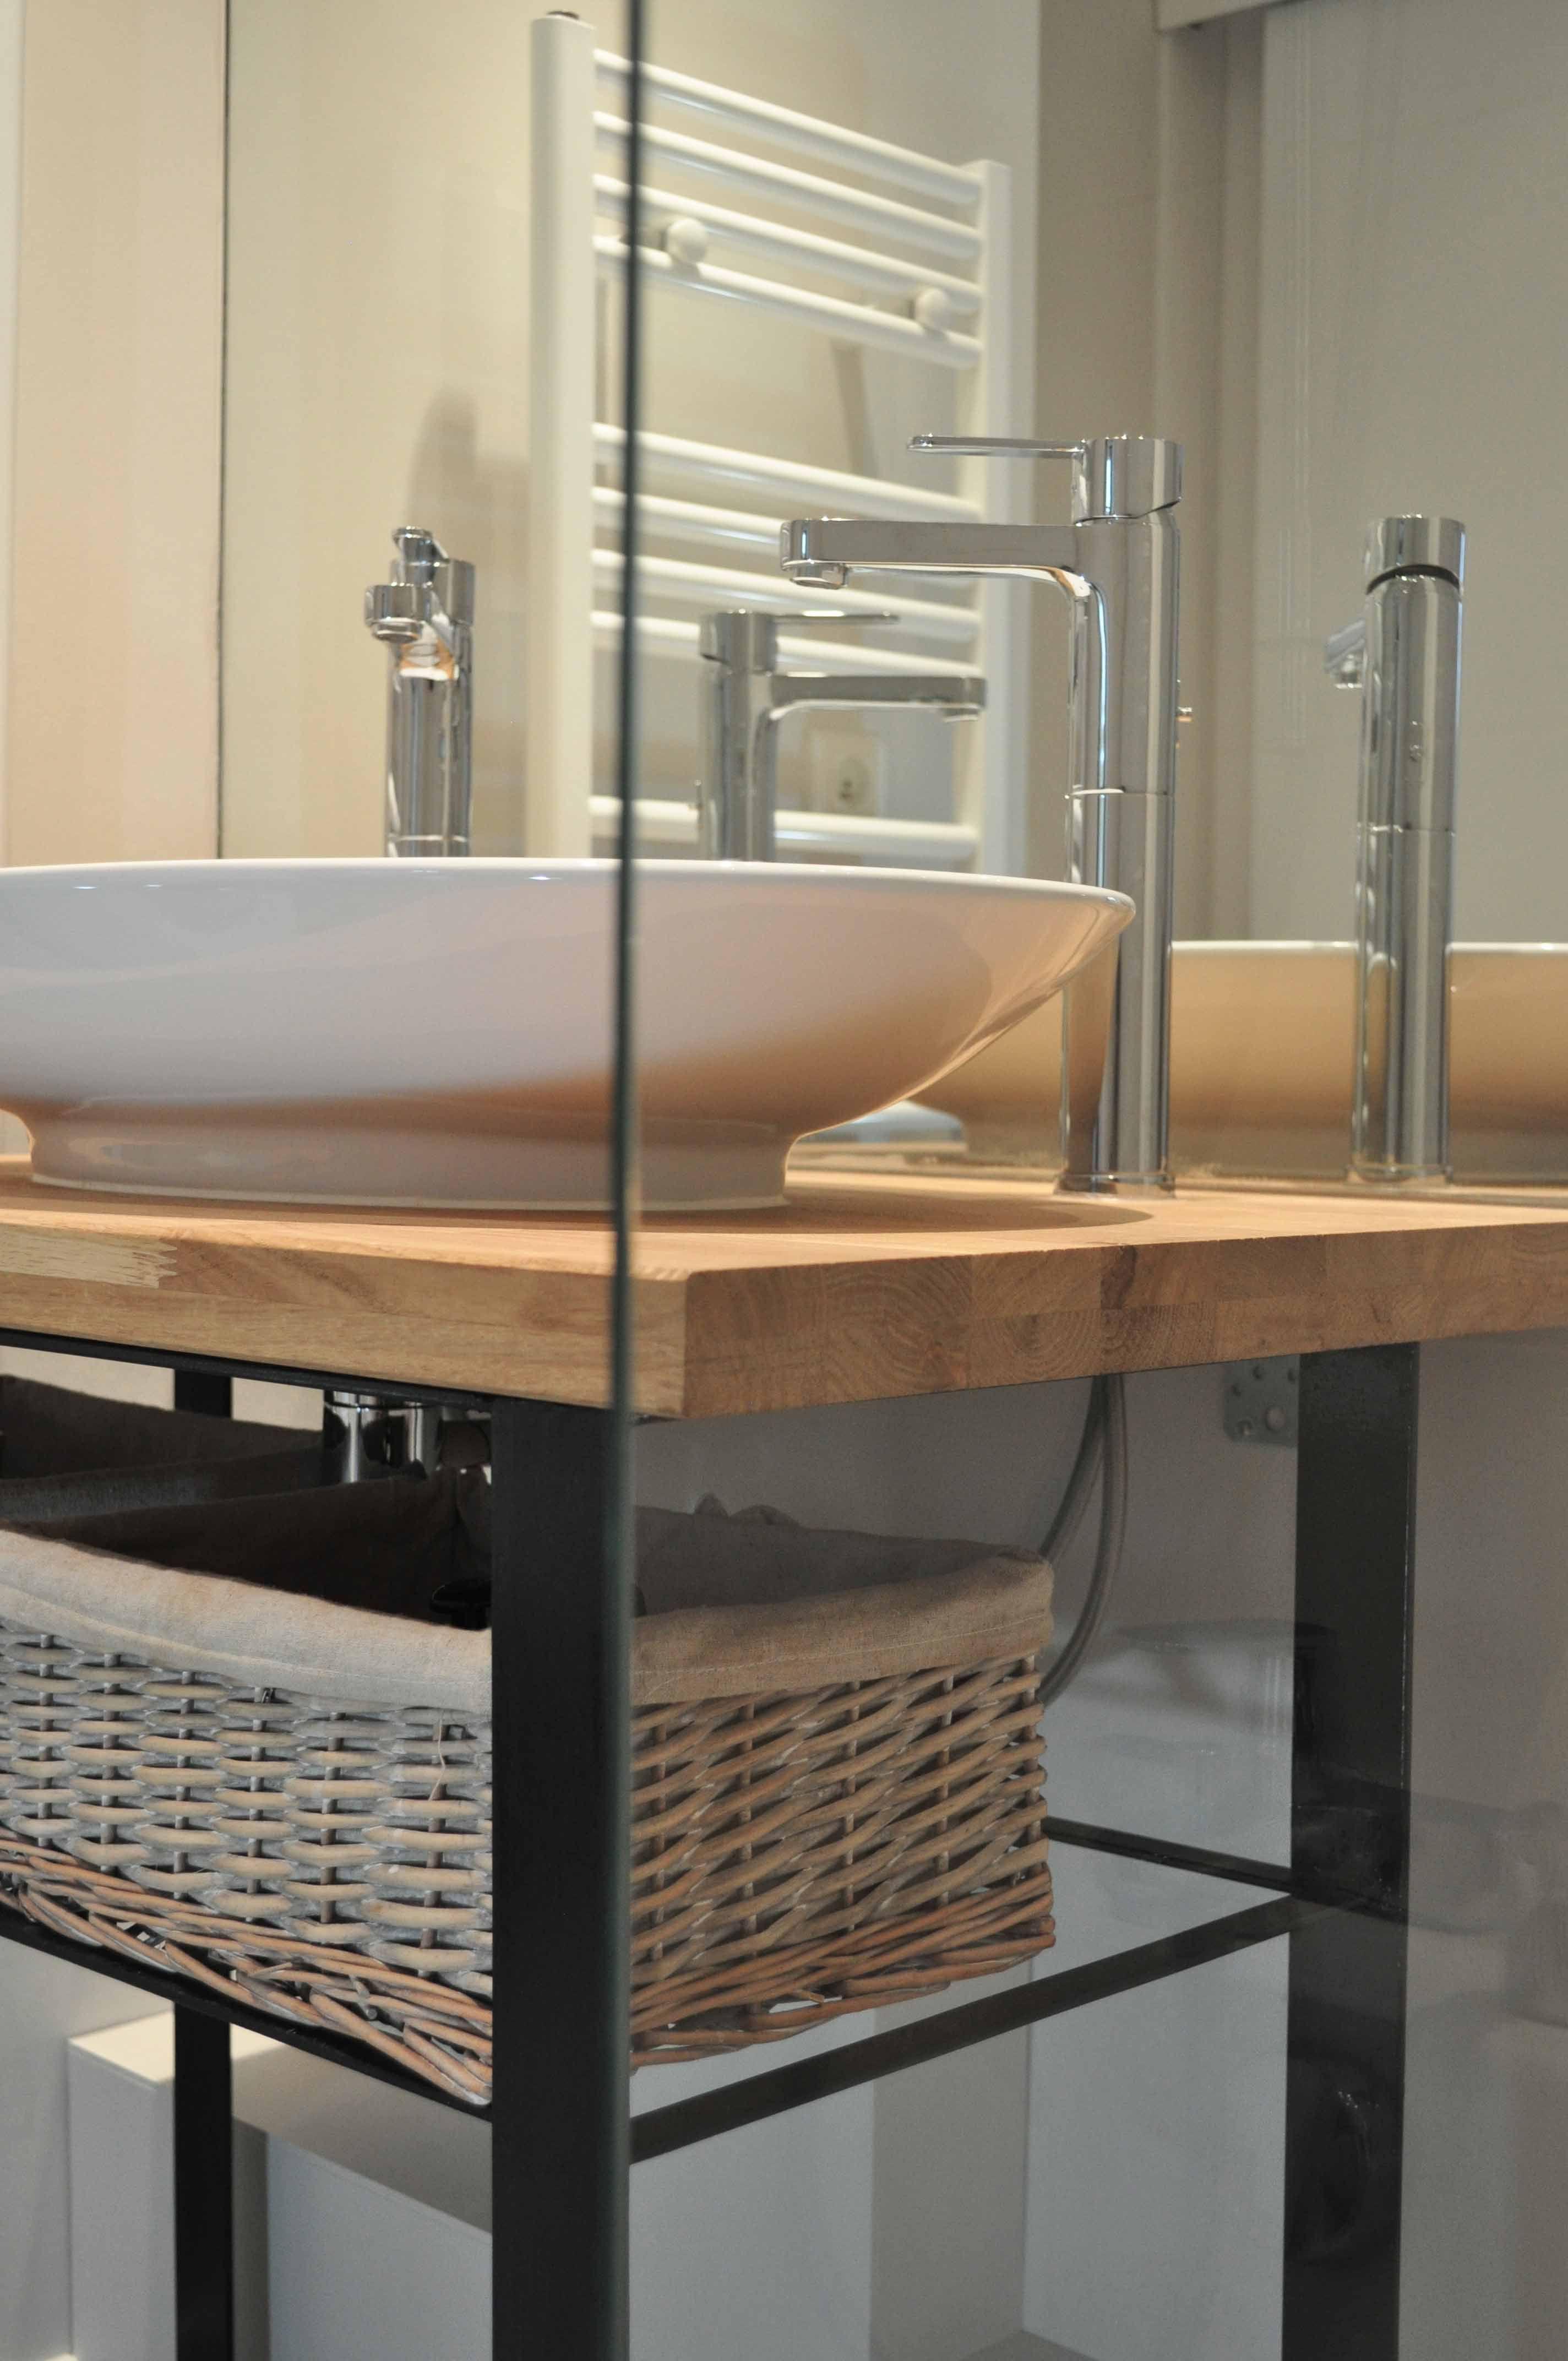 Meuble Salle De Bain Avec Vasque Sur Pied